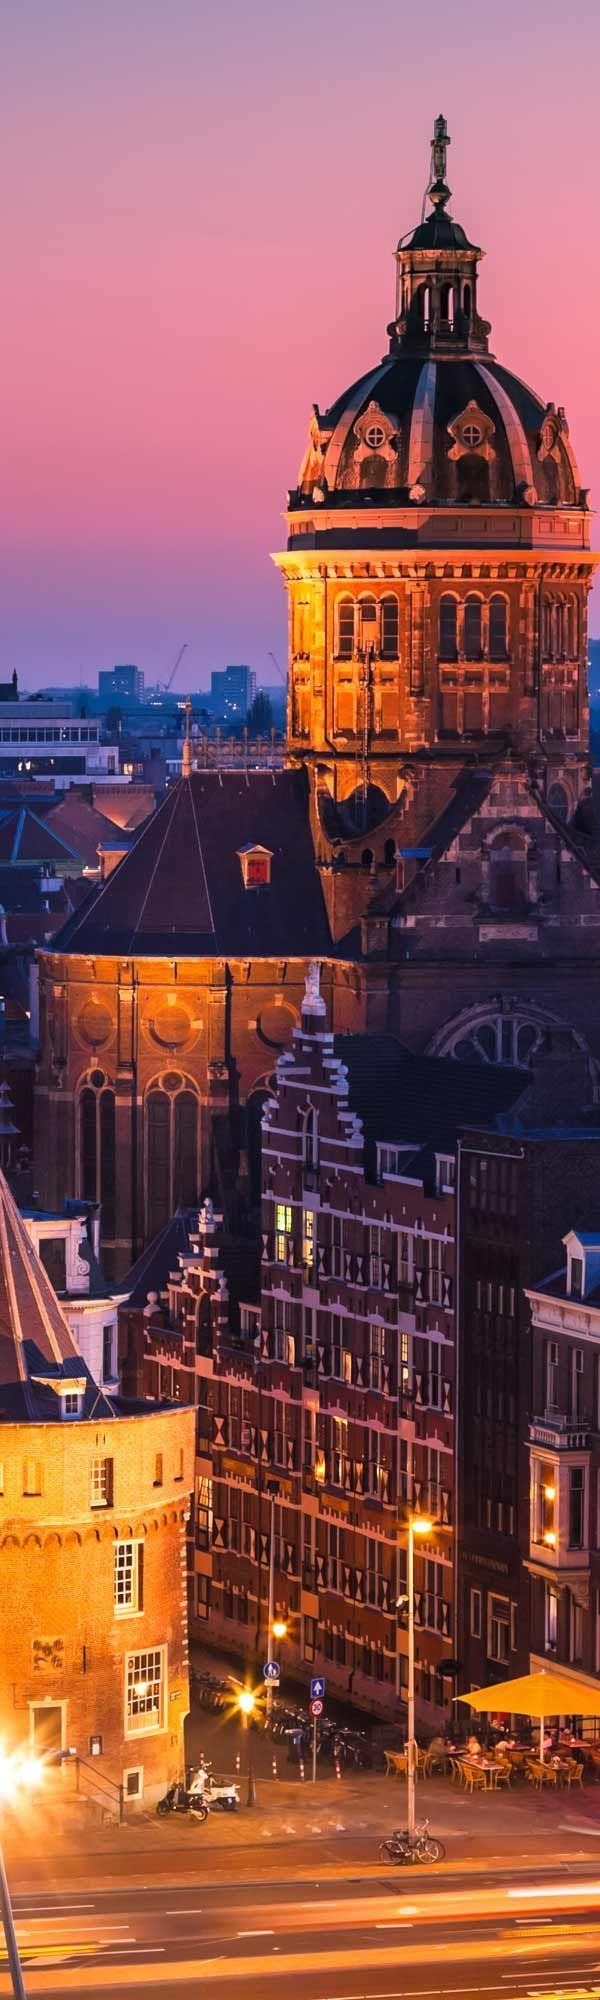 Amsterdam, The Netherlands                                                                                                                                                                                 もっと見る